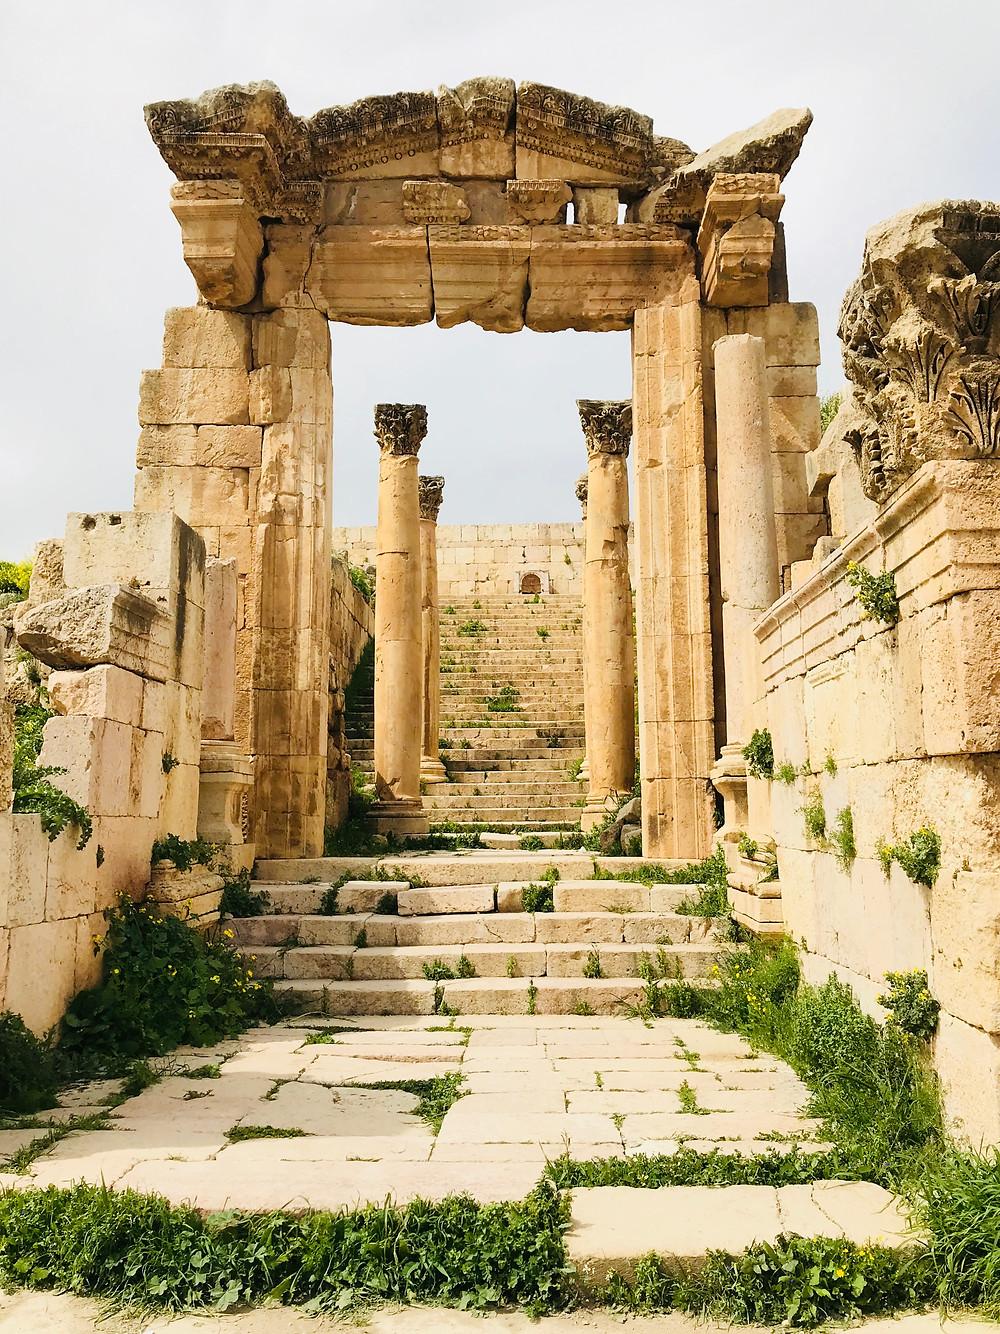 A crumbling carved entranceway at Jerash in Jordan